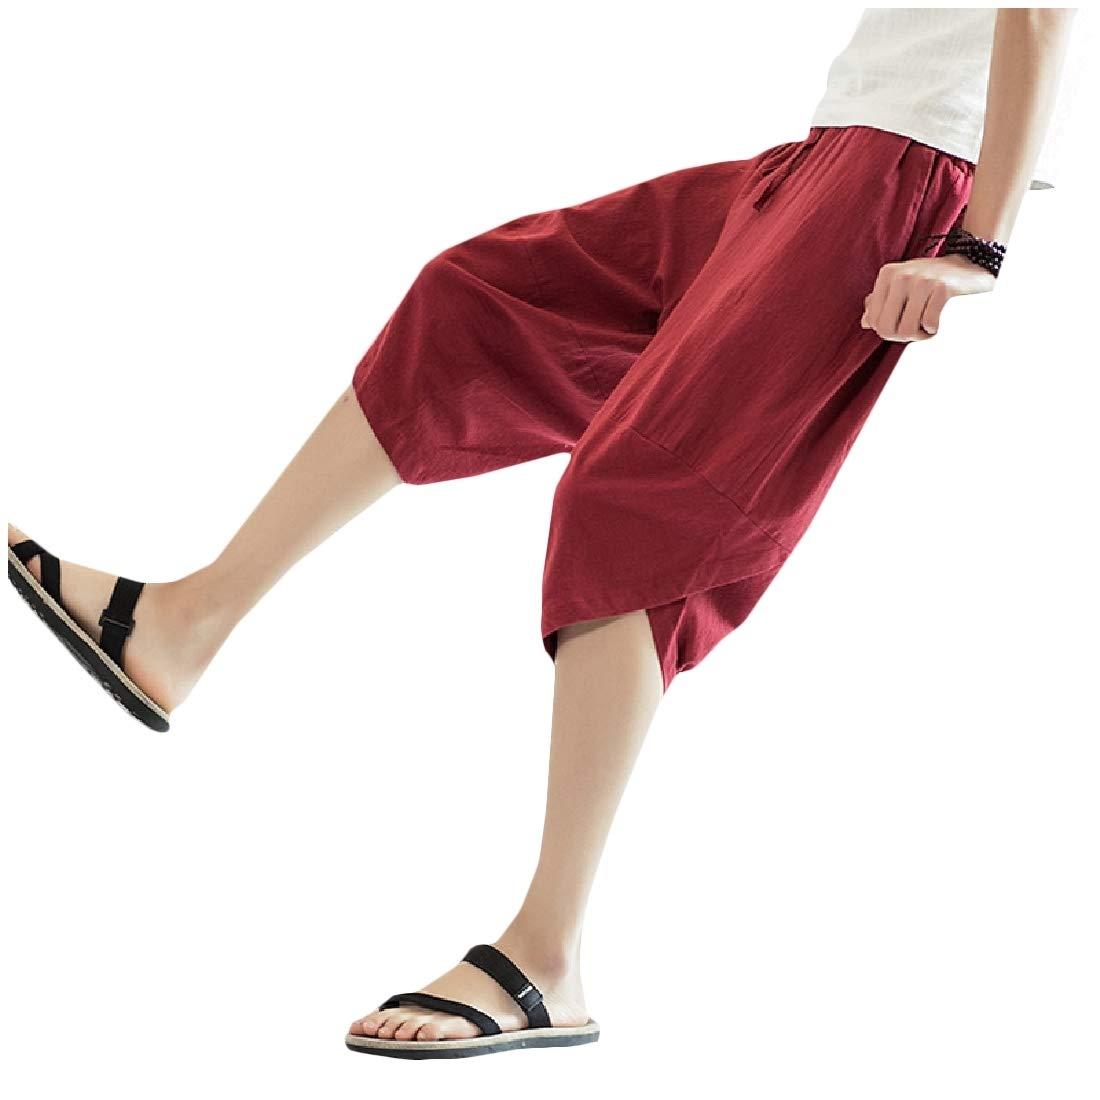 Winwinus Mens Harem Pants Plus Size Pockets Chinese Style Comfy Casual Pants